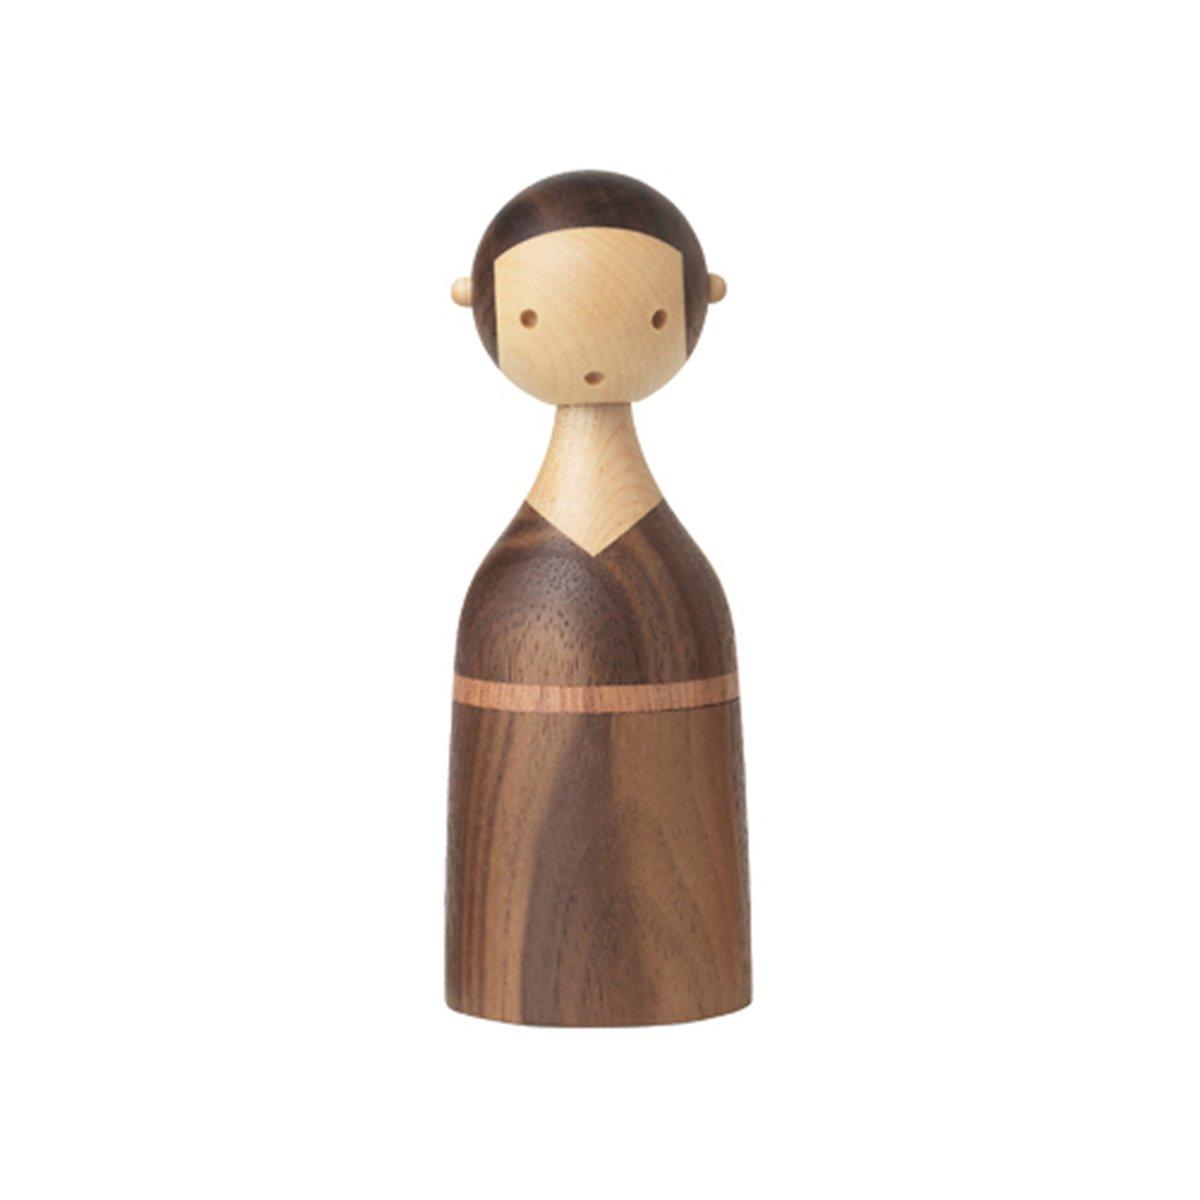 Architectmade Kin Mom figuuri